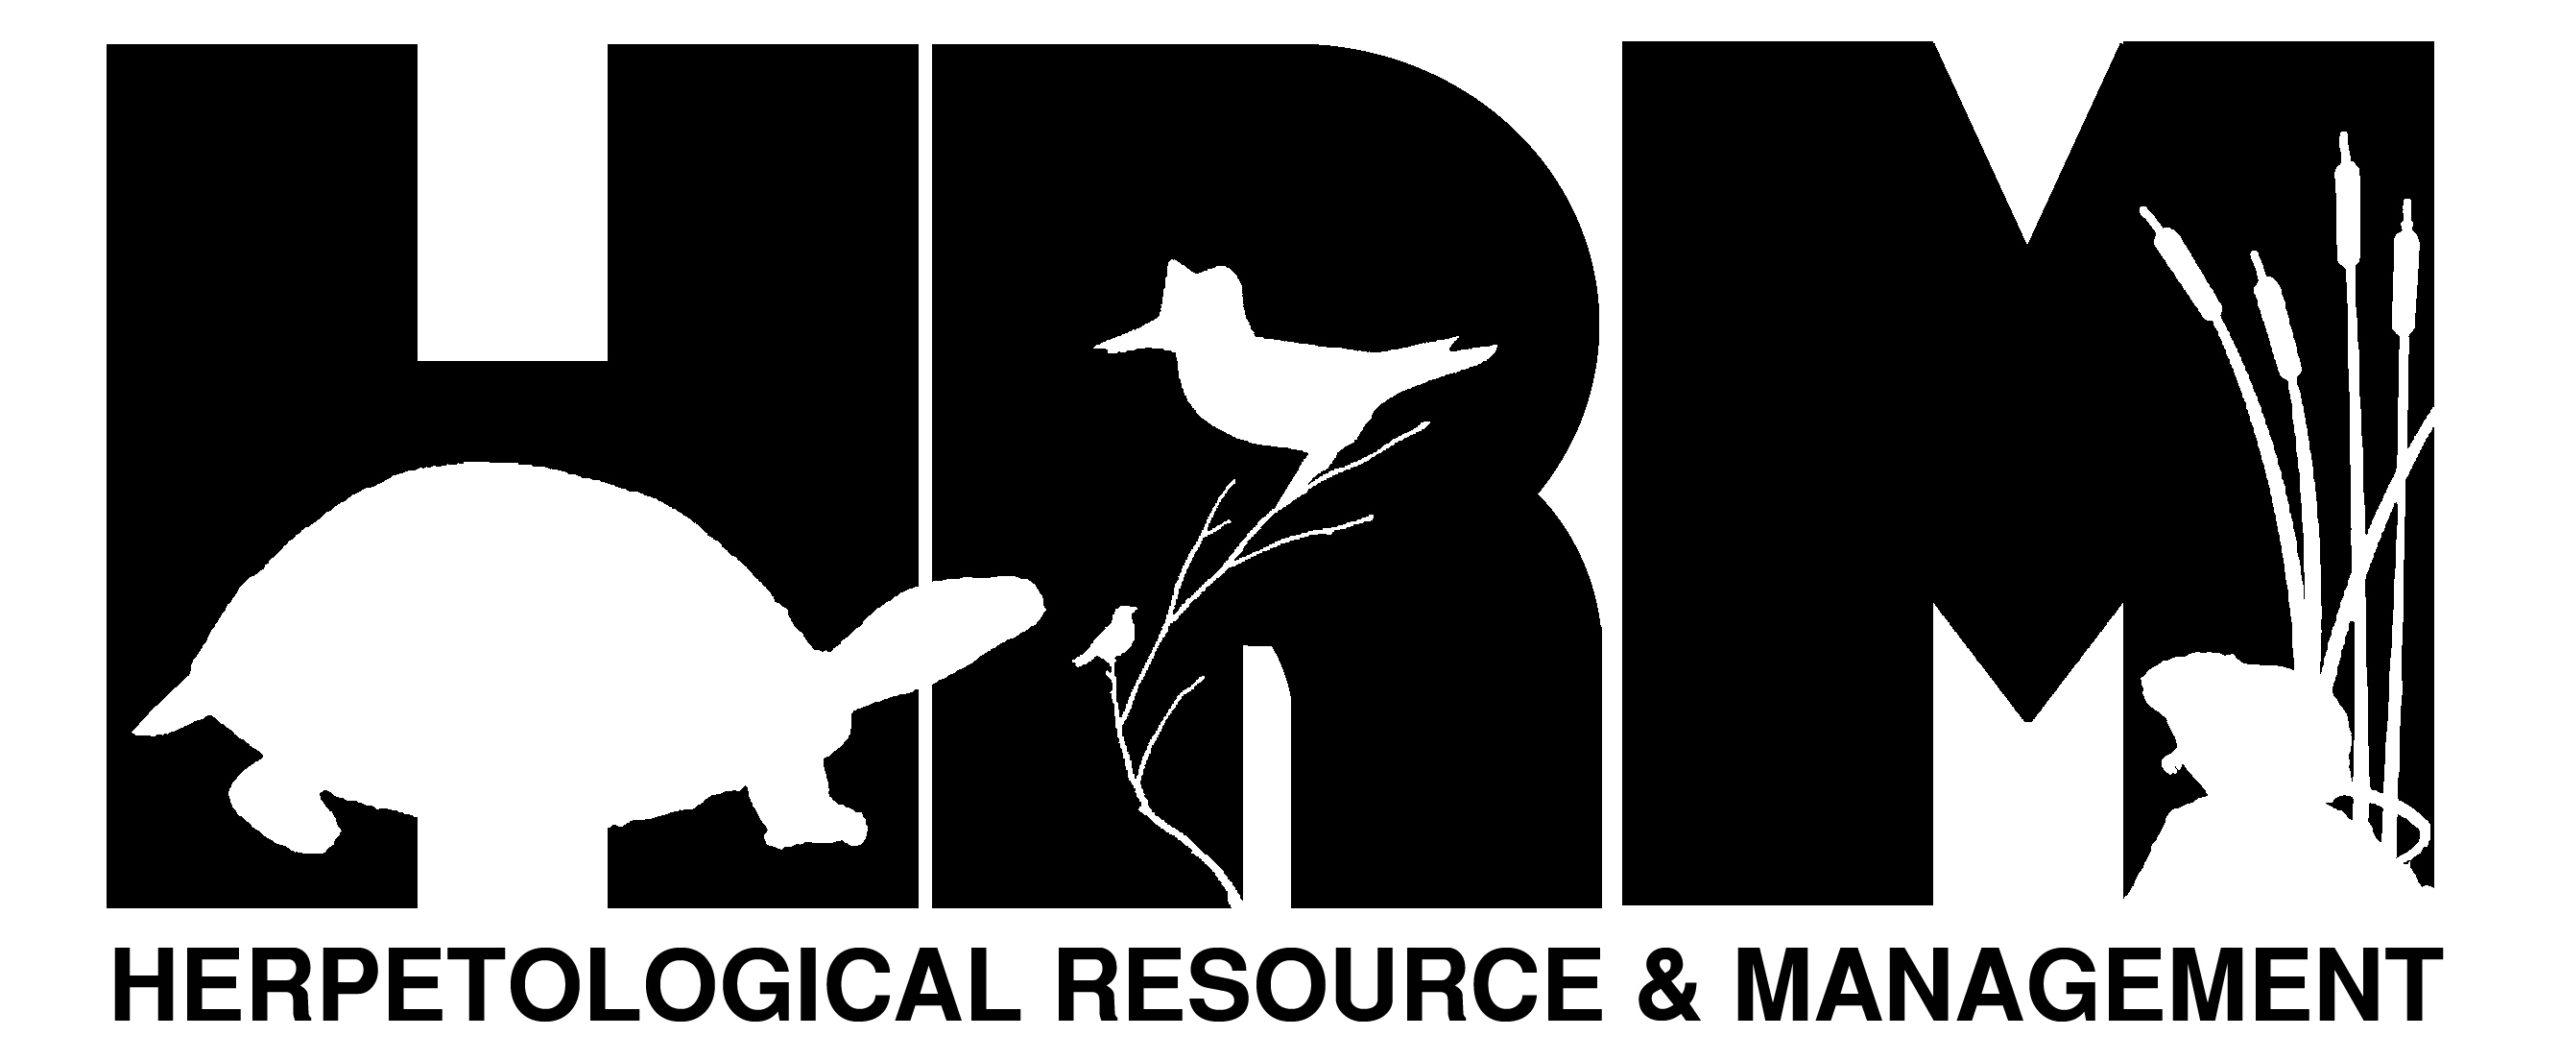 HRM logo black on white (crop)